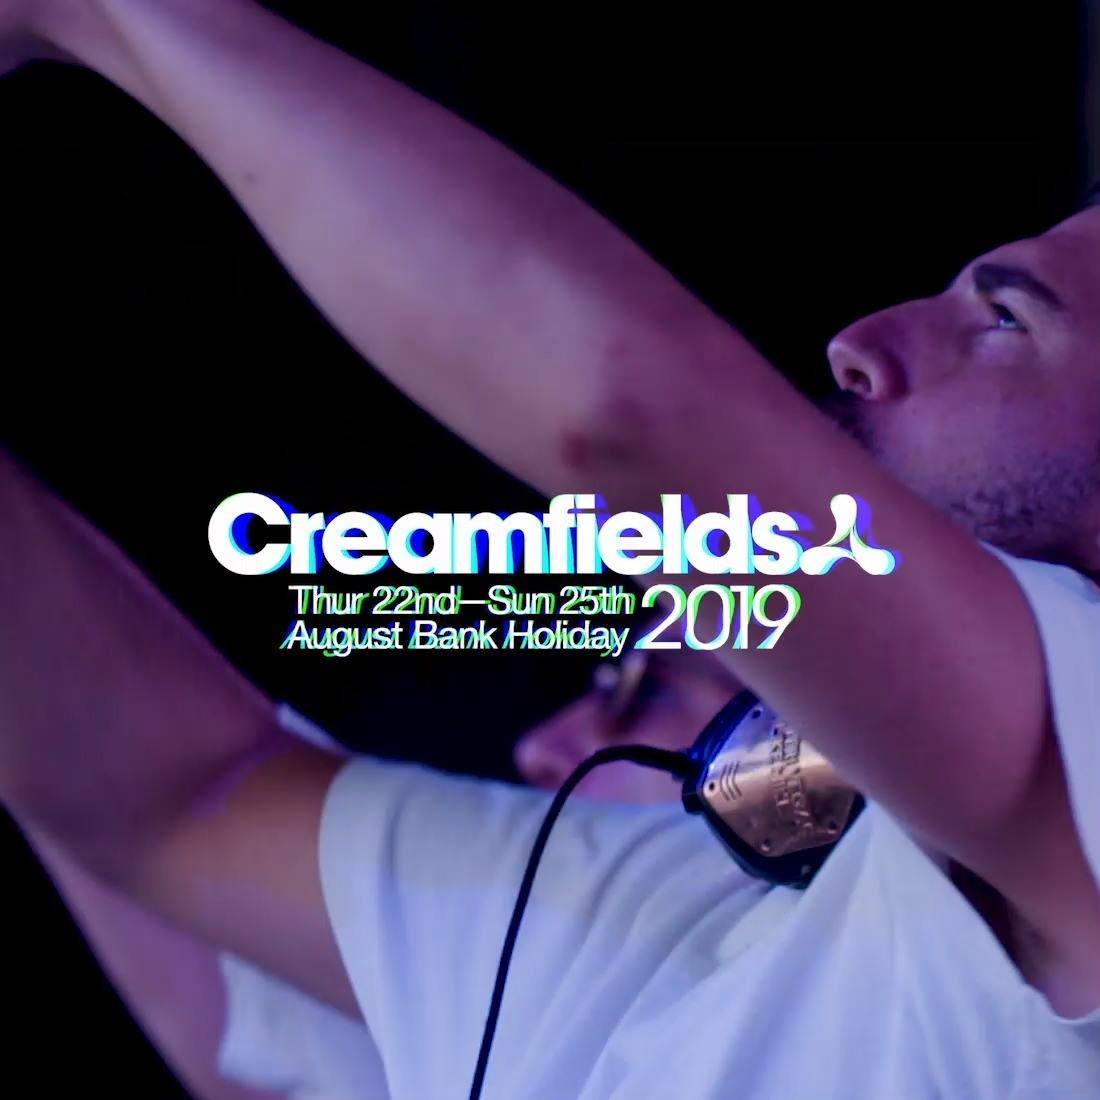 Creamfields news : Creamfields 2019 | Festival Flyer